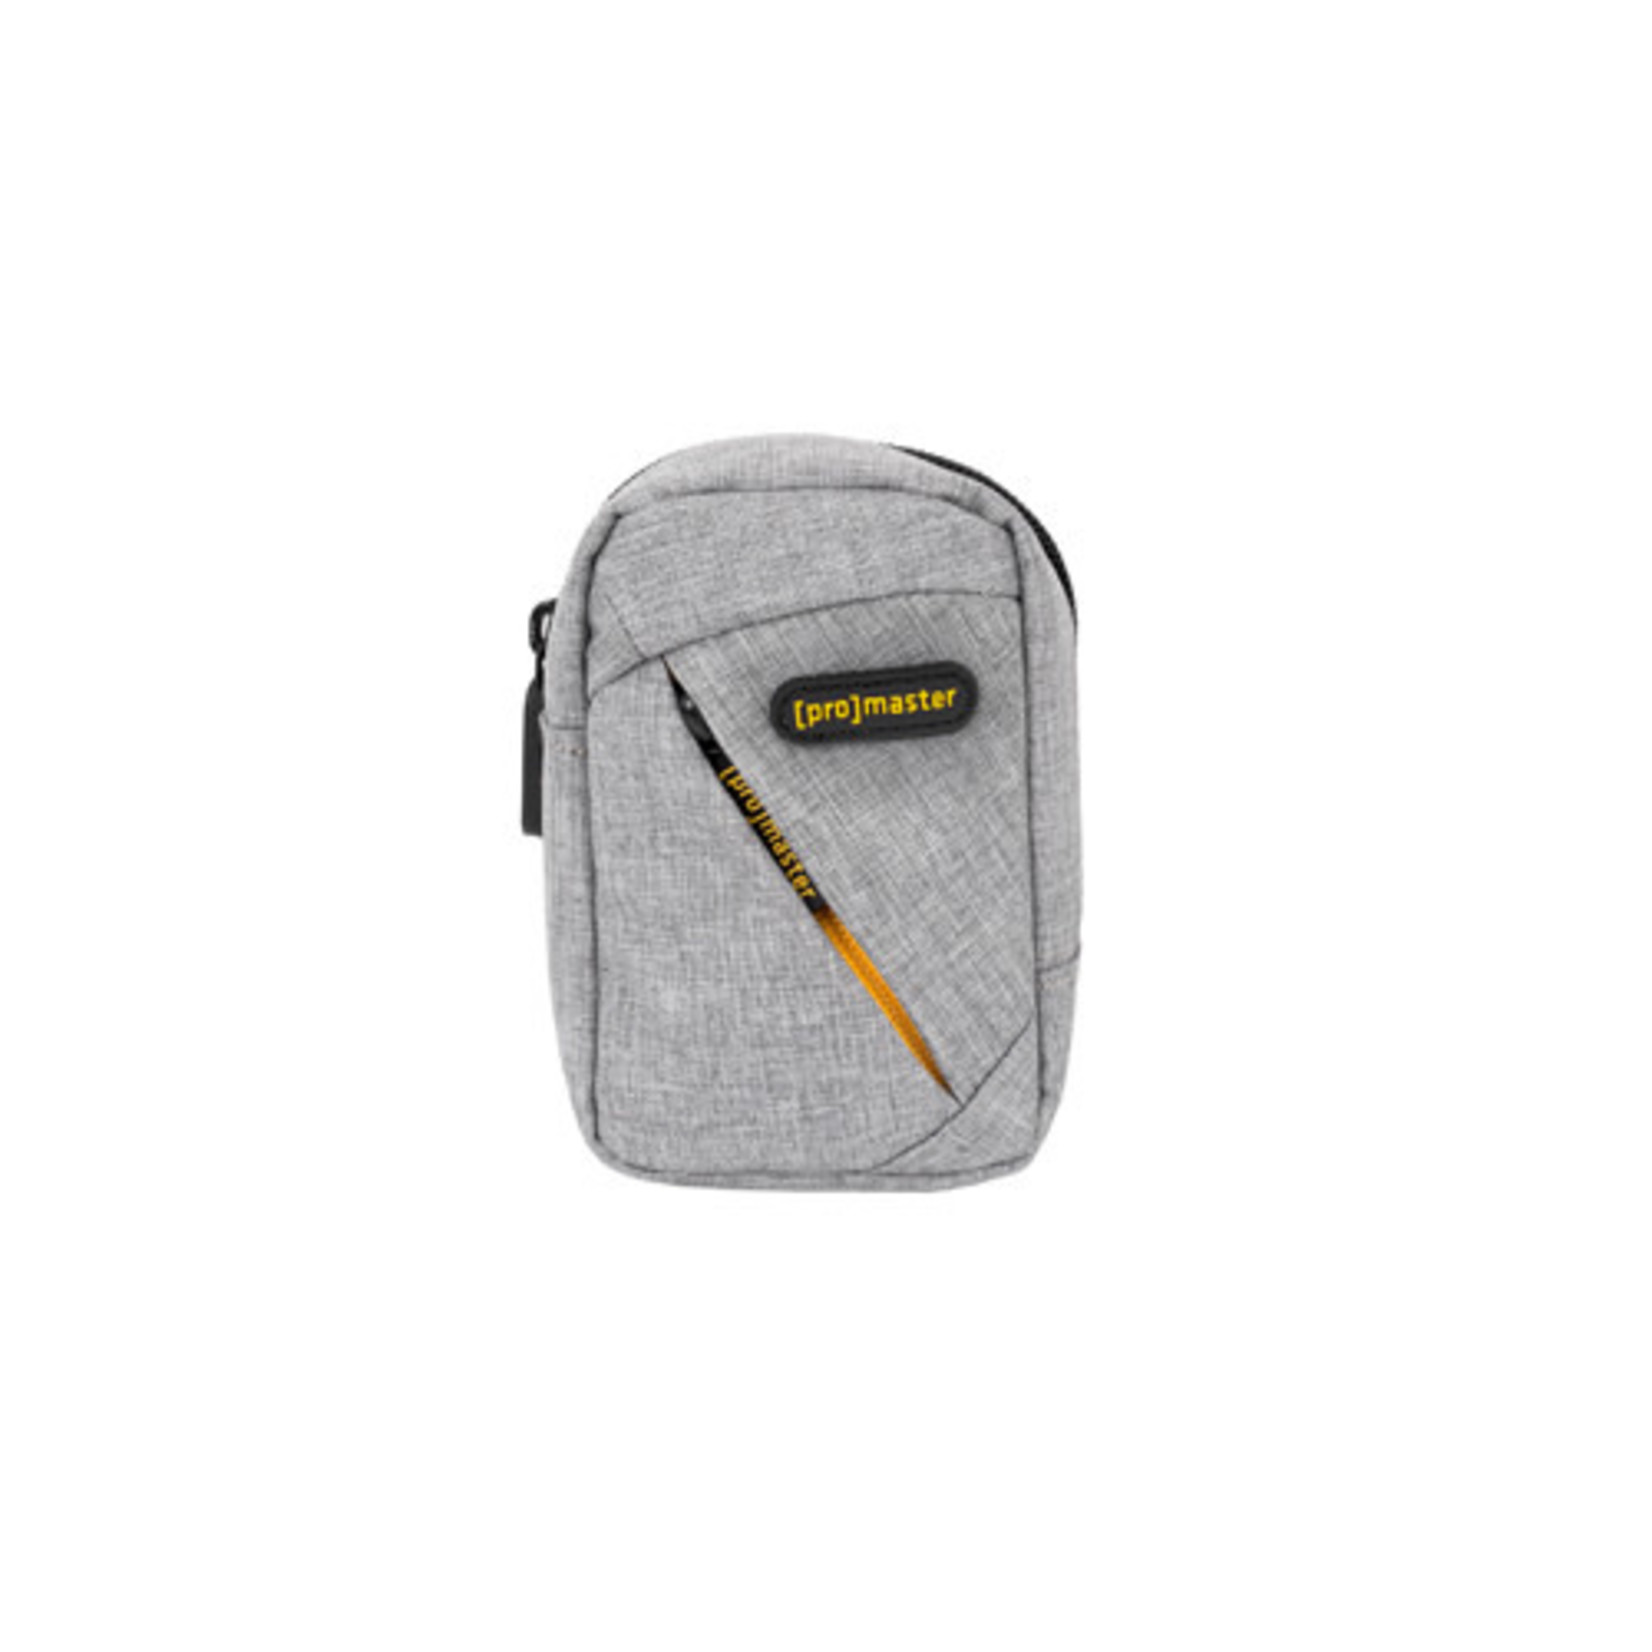 ProMaster Impulse Small Pouch Case - Grey